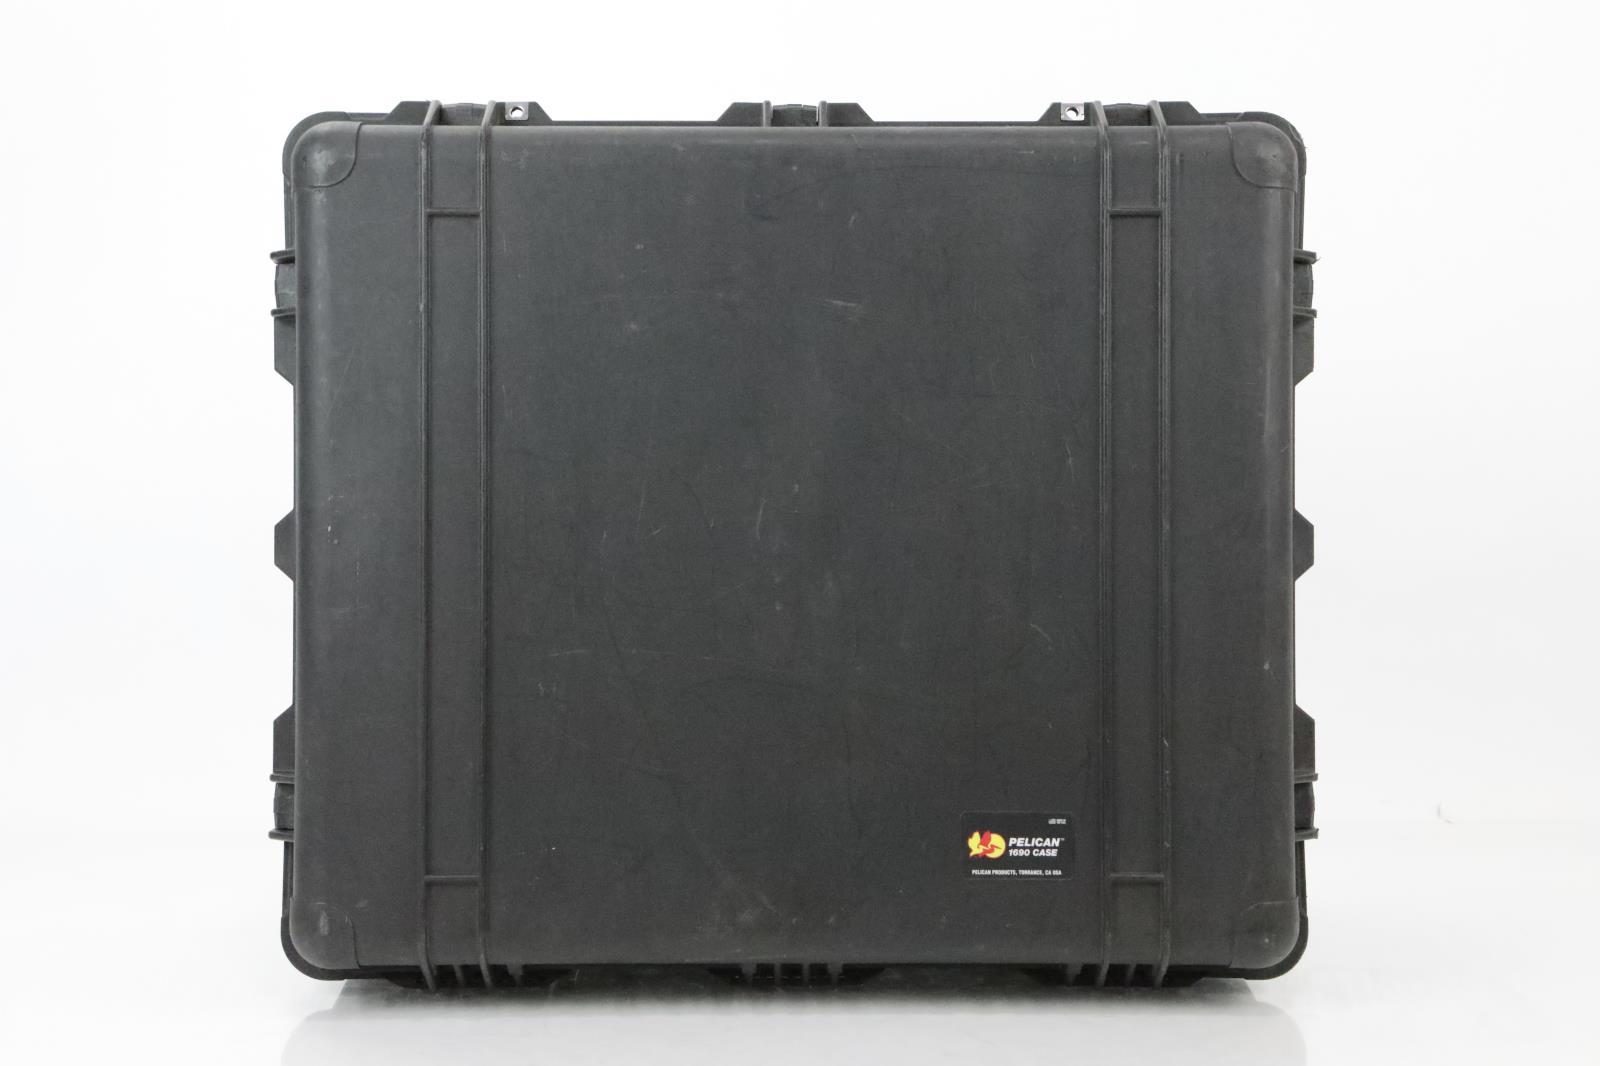 Pelican 1690 Audio Video Accessory Utility & Lid Organizer & B&W Case #34391